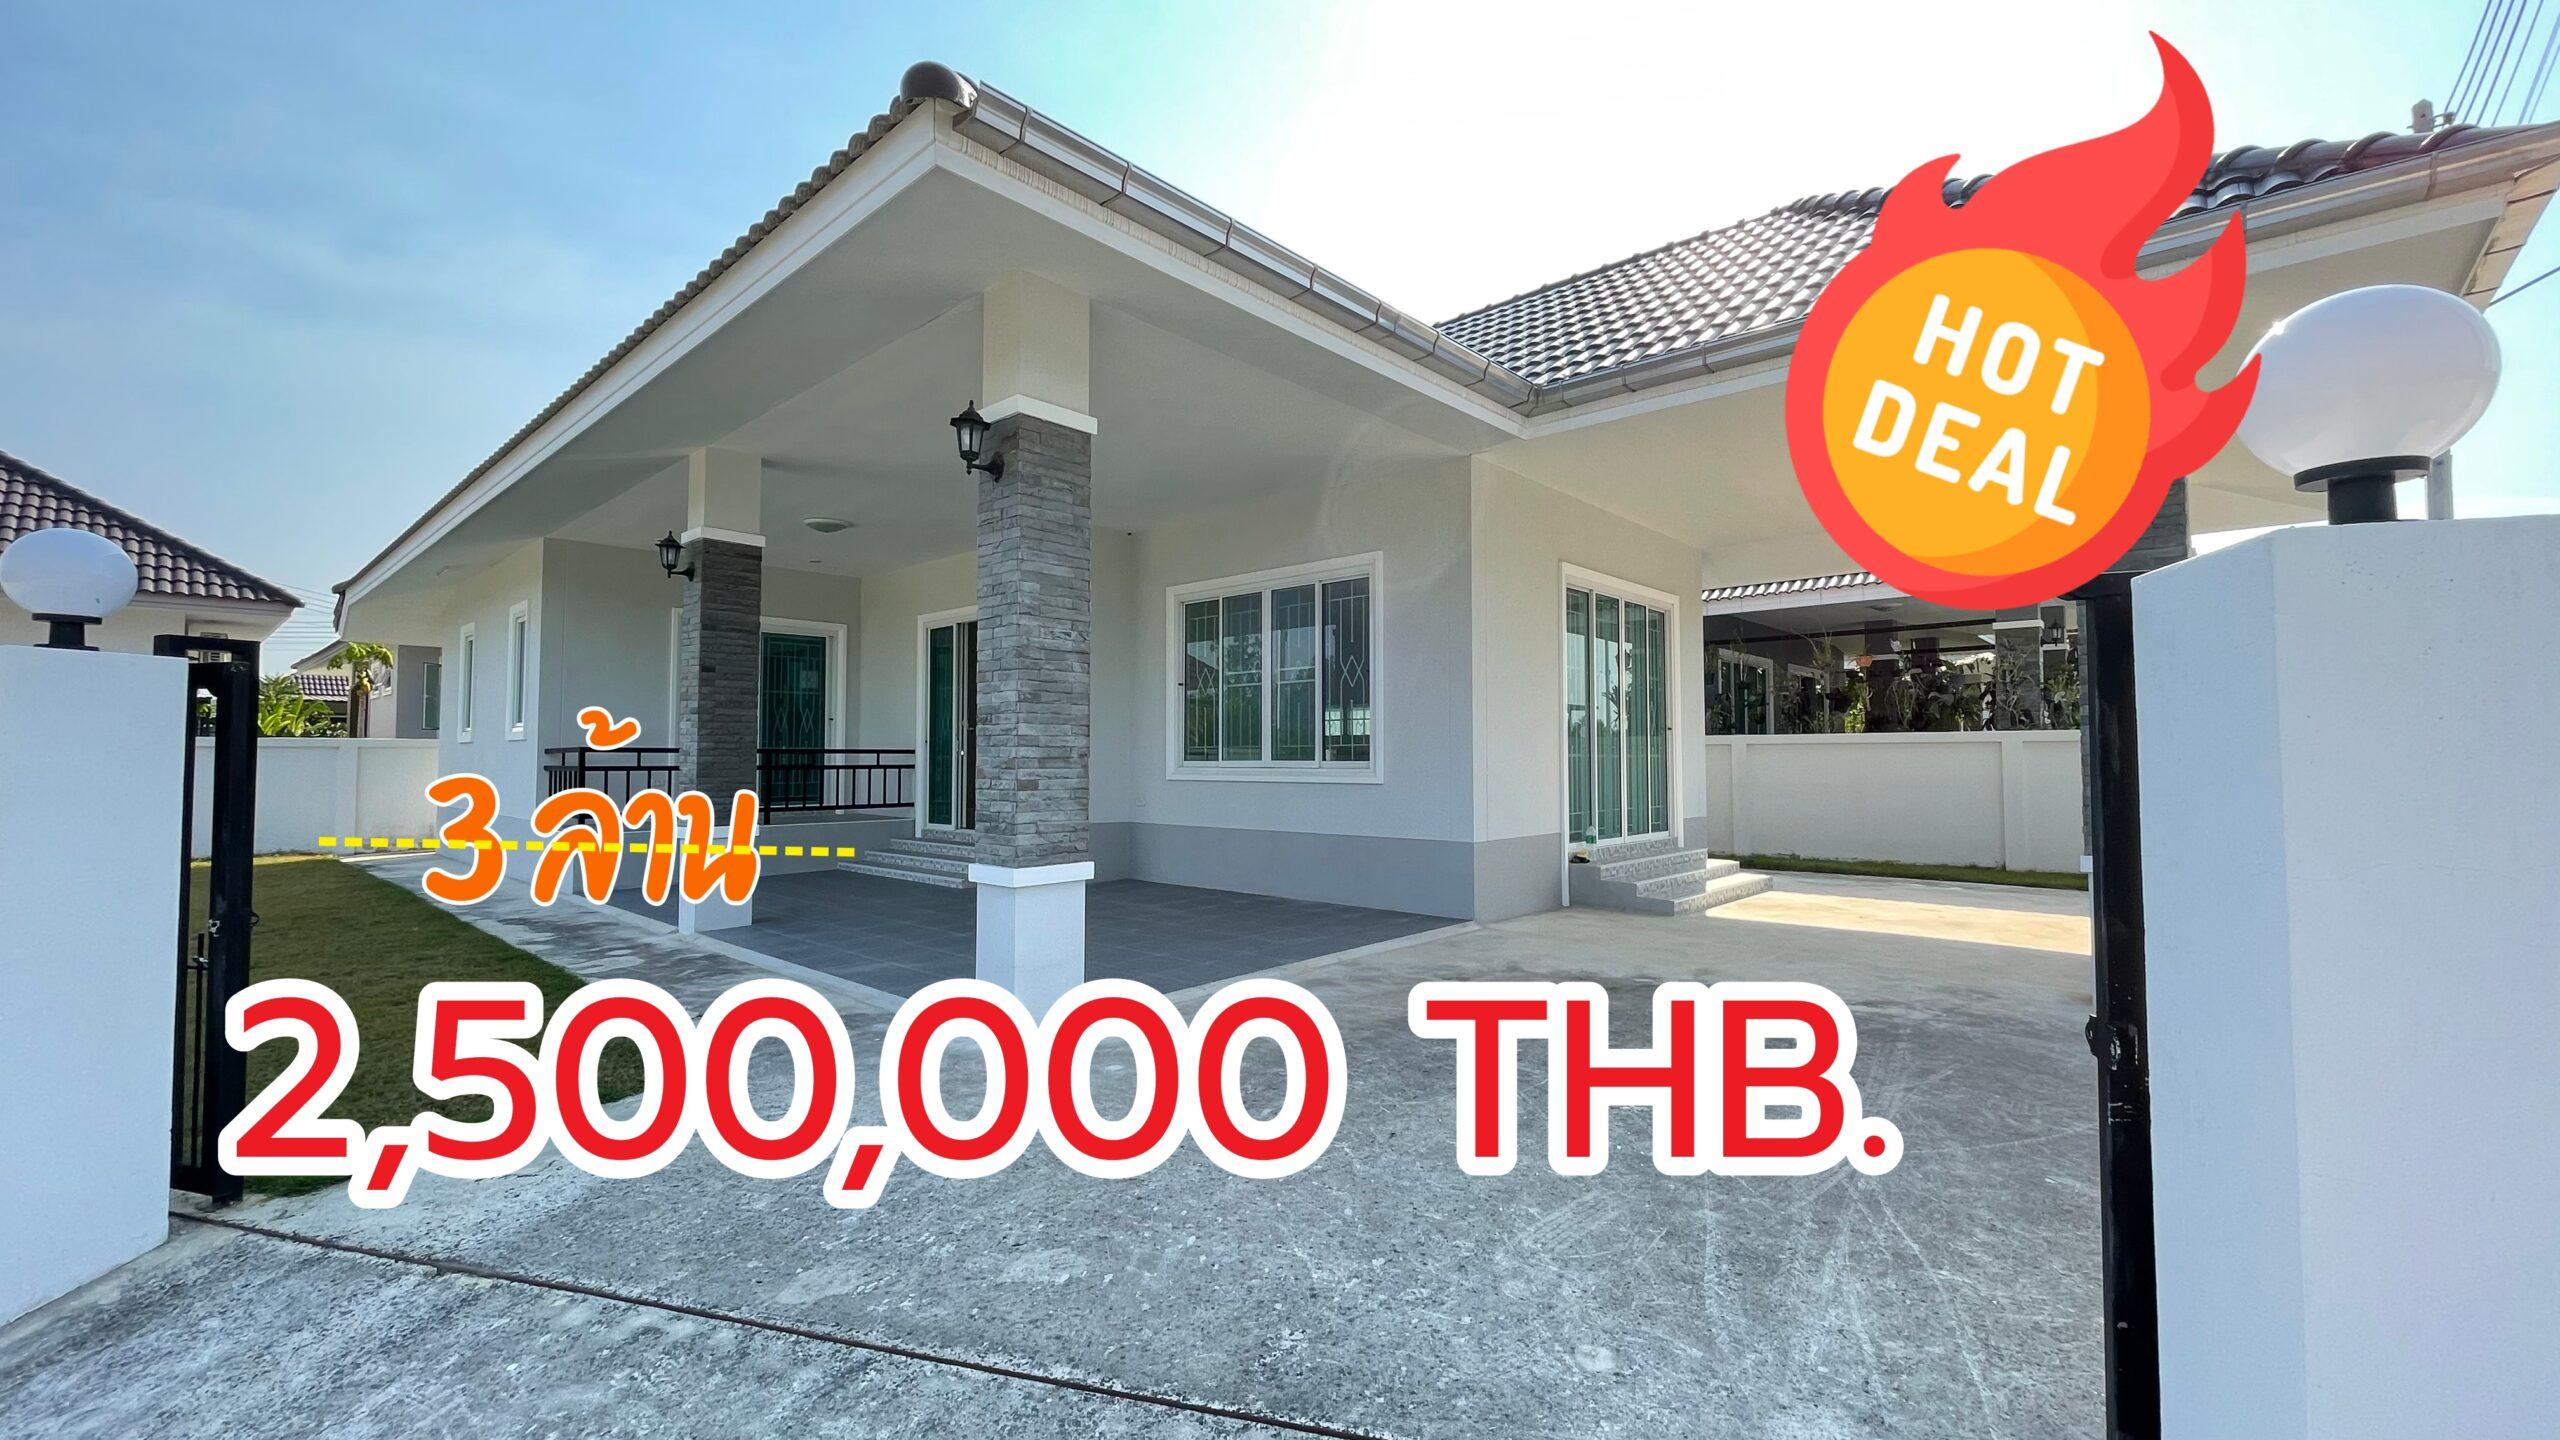 Hot Deal!! ขายด่วนบ้านเดี่ยวหัวหิน  Hua Hin House For Sale